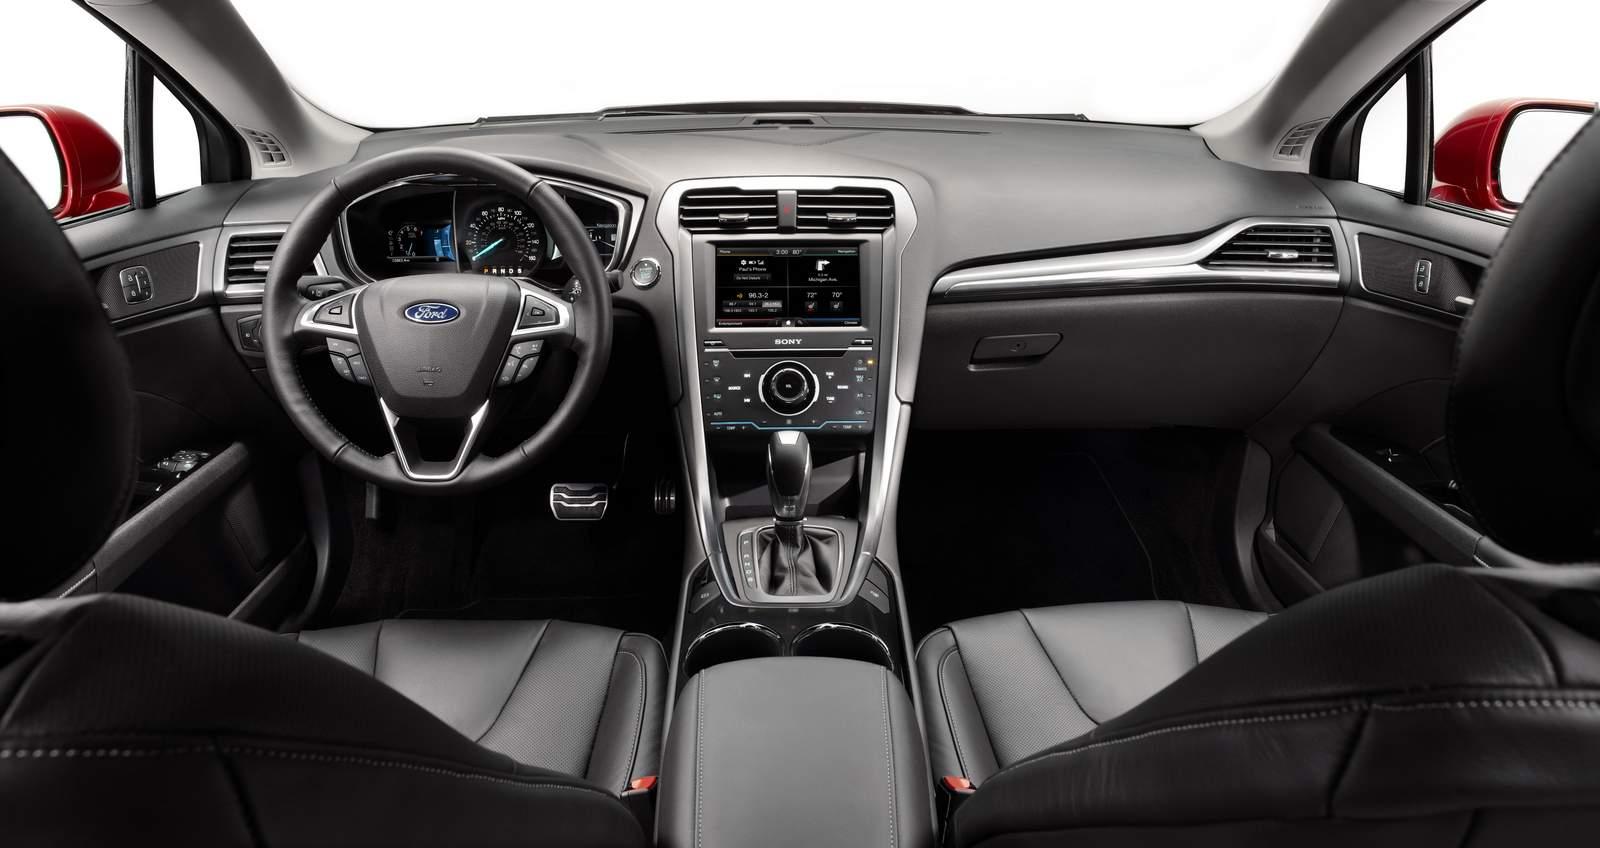 Fusion titanium fwd 2 0 pre o sobe para r reais car blog br for 2015 ford fusion titanium interior